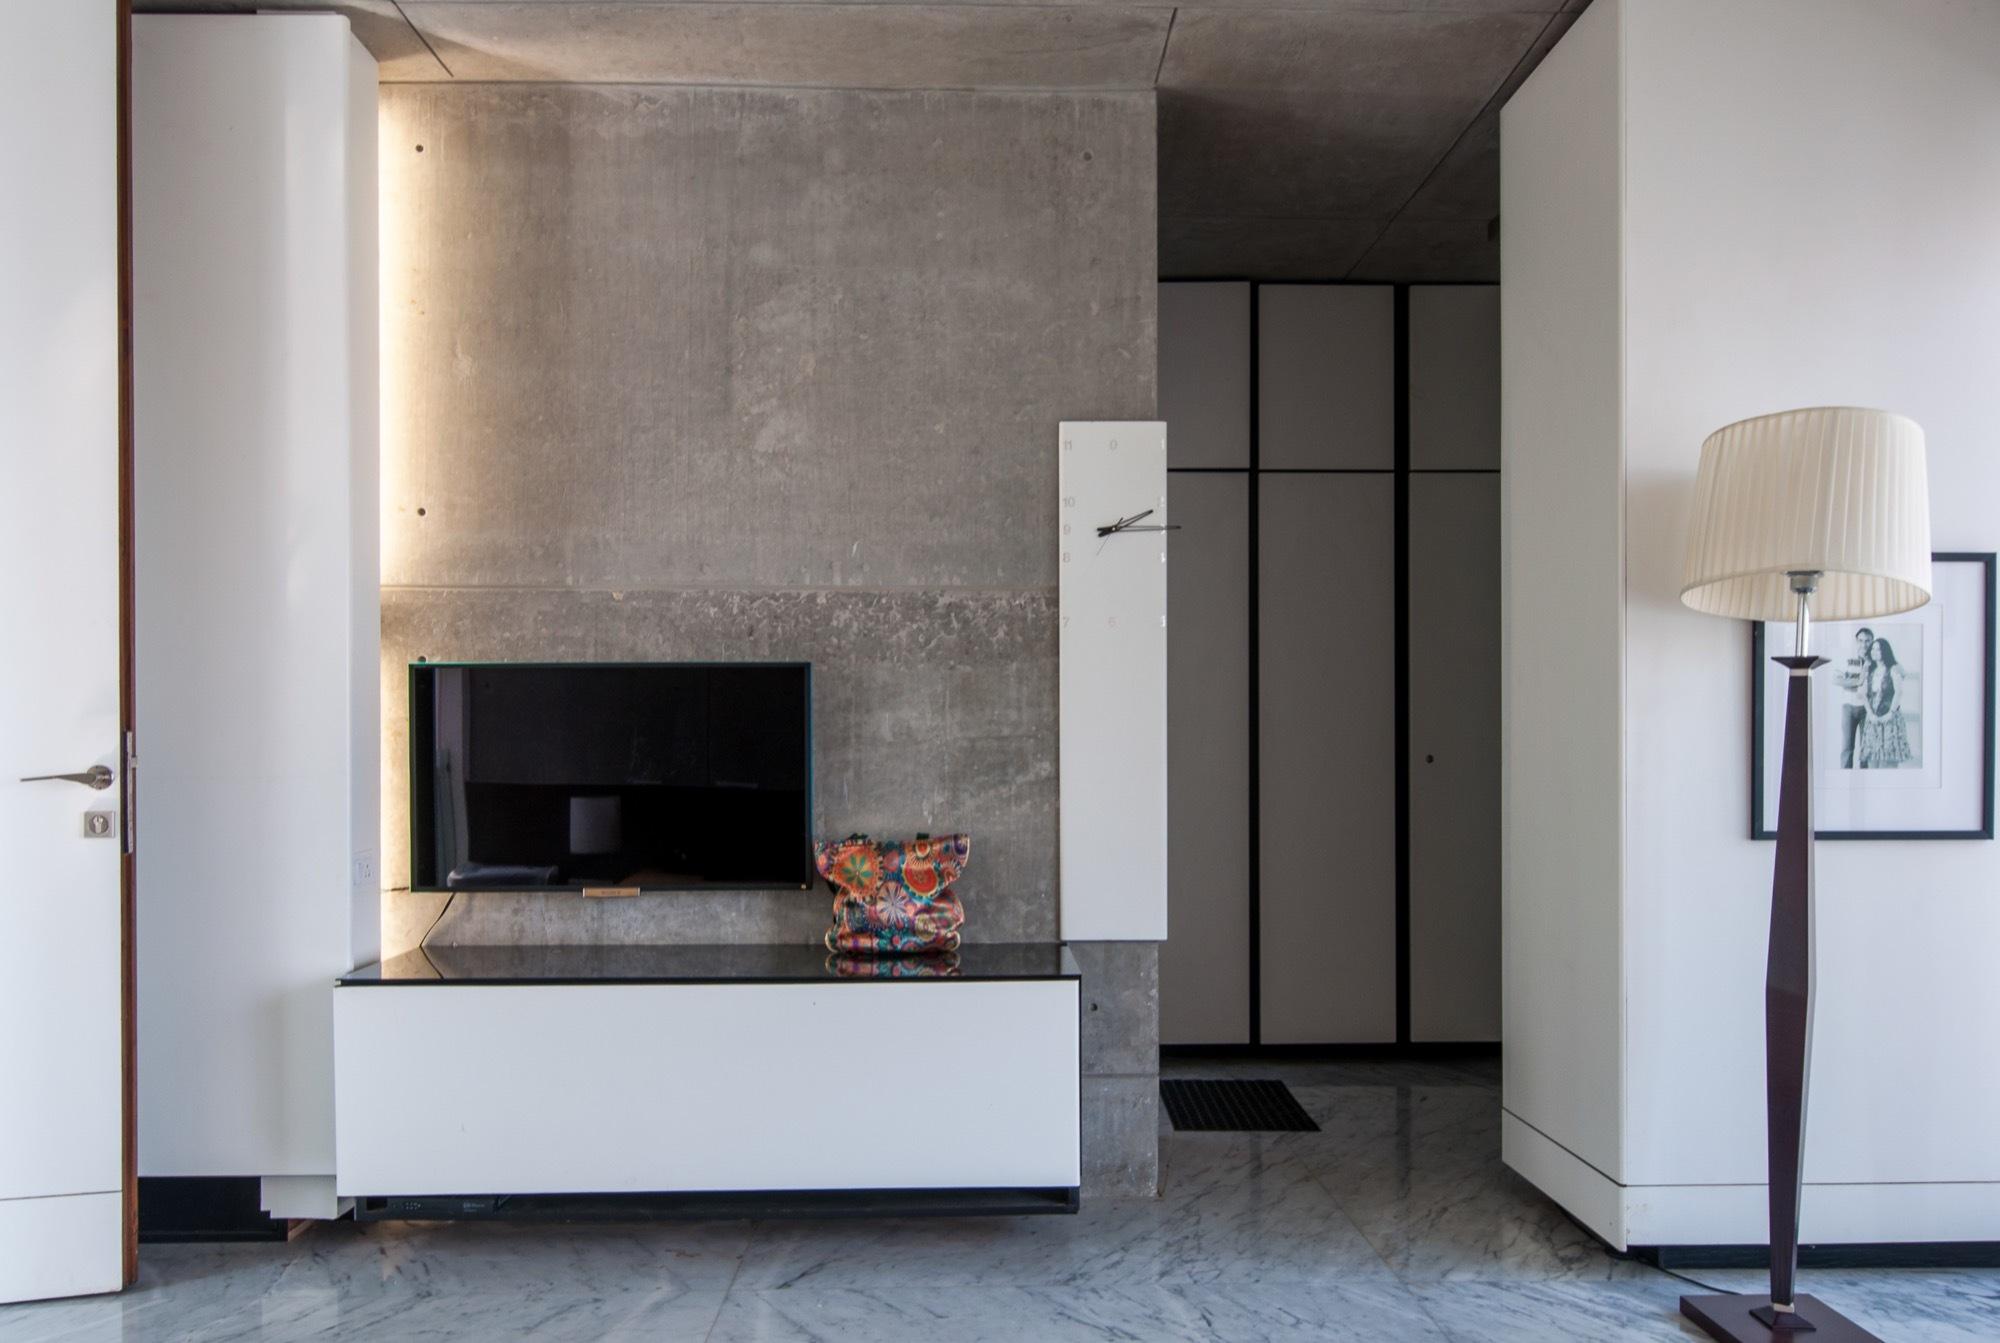 galeria de resid ncia s 91 design buro architects 7. Black Bedroom Furniture Sets. Home Design Ideas